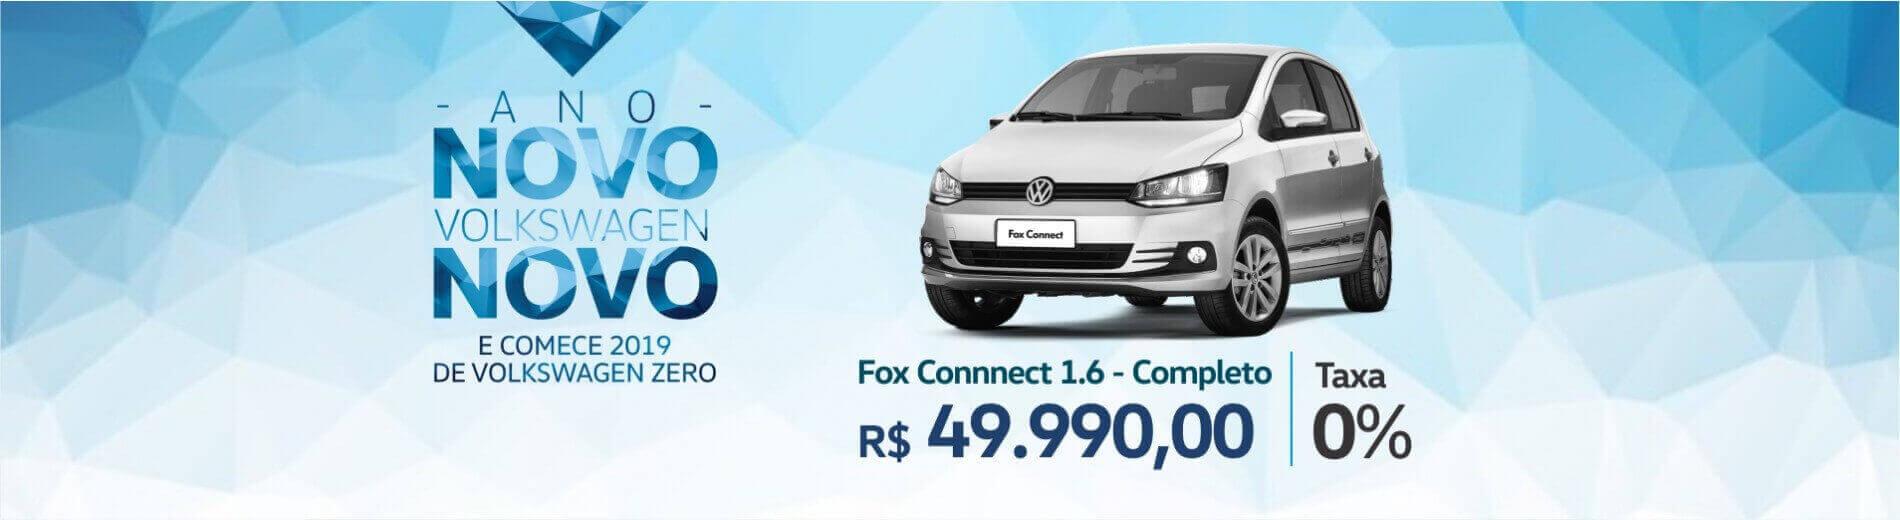 ANO NOVO VW NOVO - Volkswagen Fox Connect 1.6 MSI